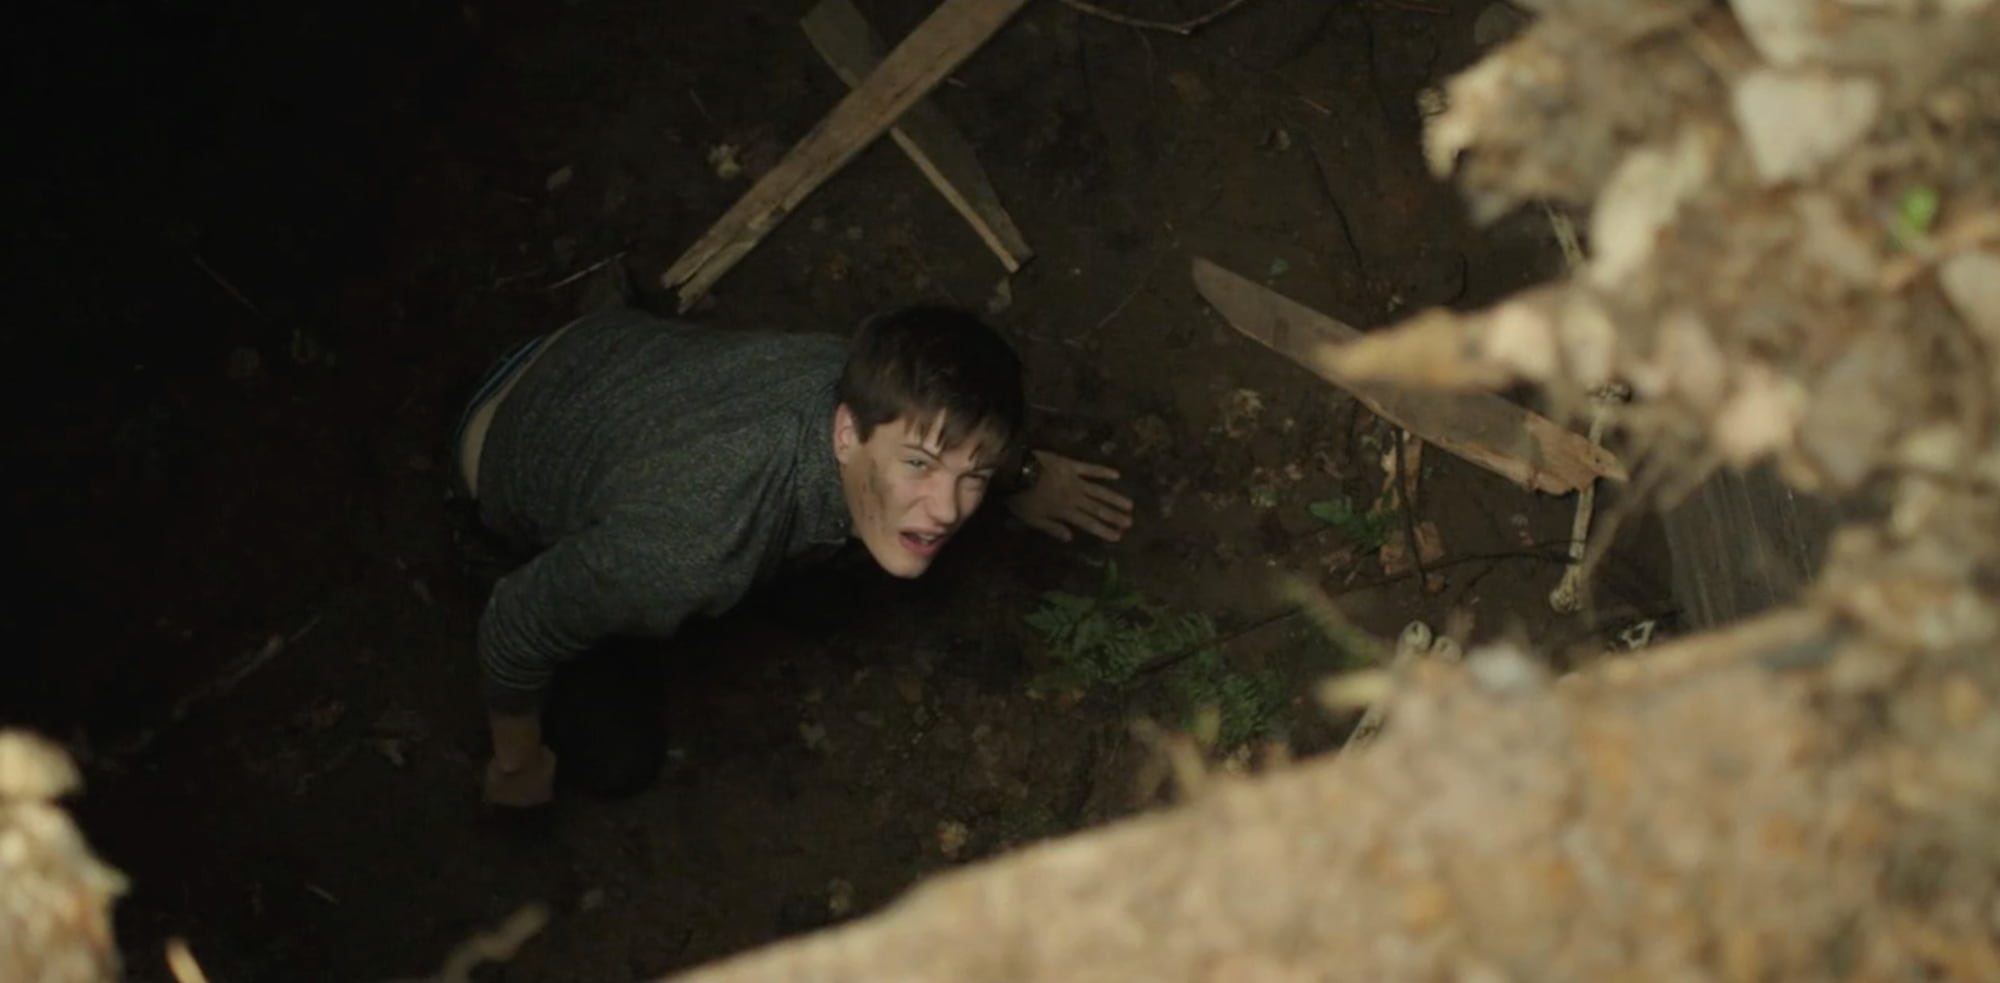 Teenage boy at bottom of pit